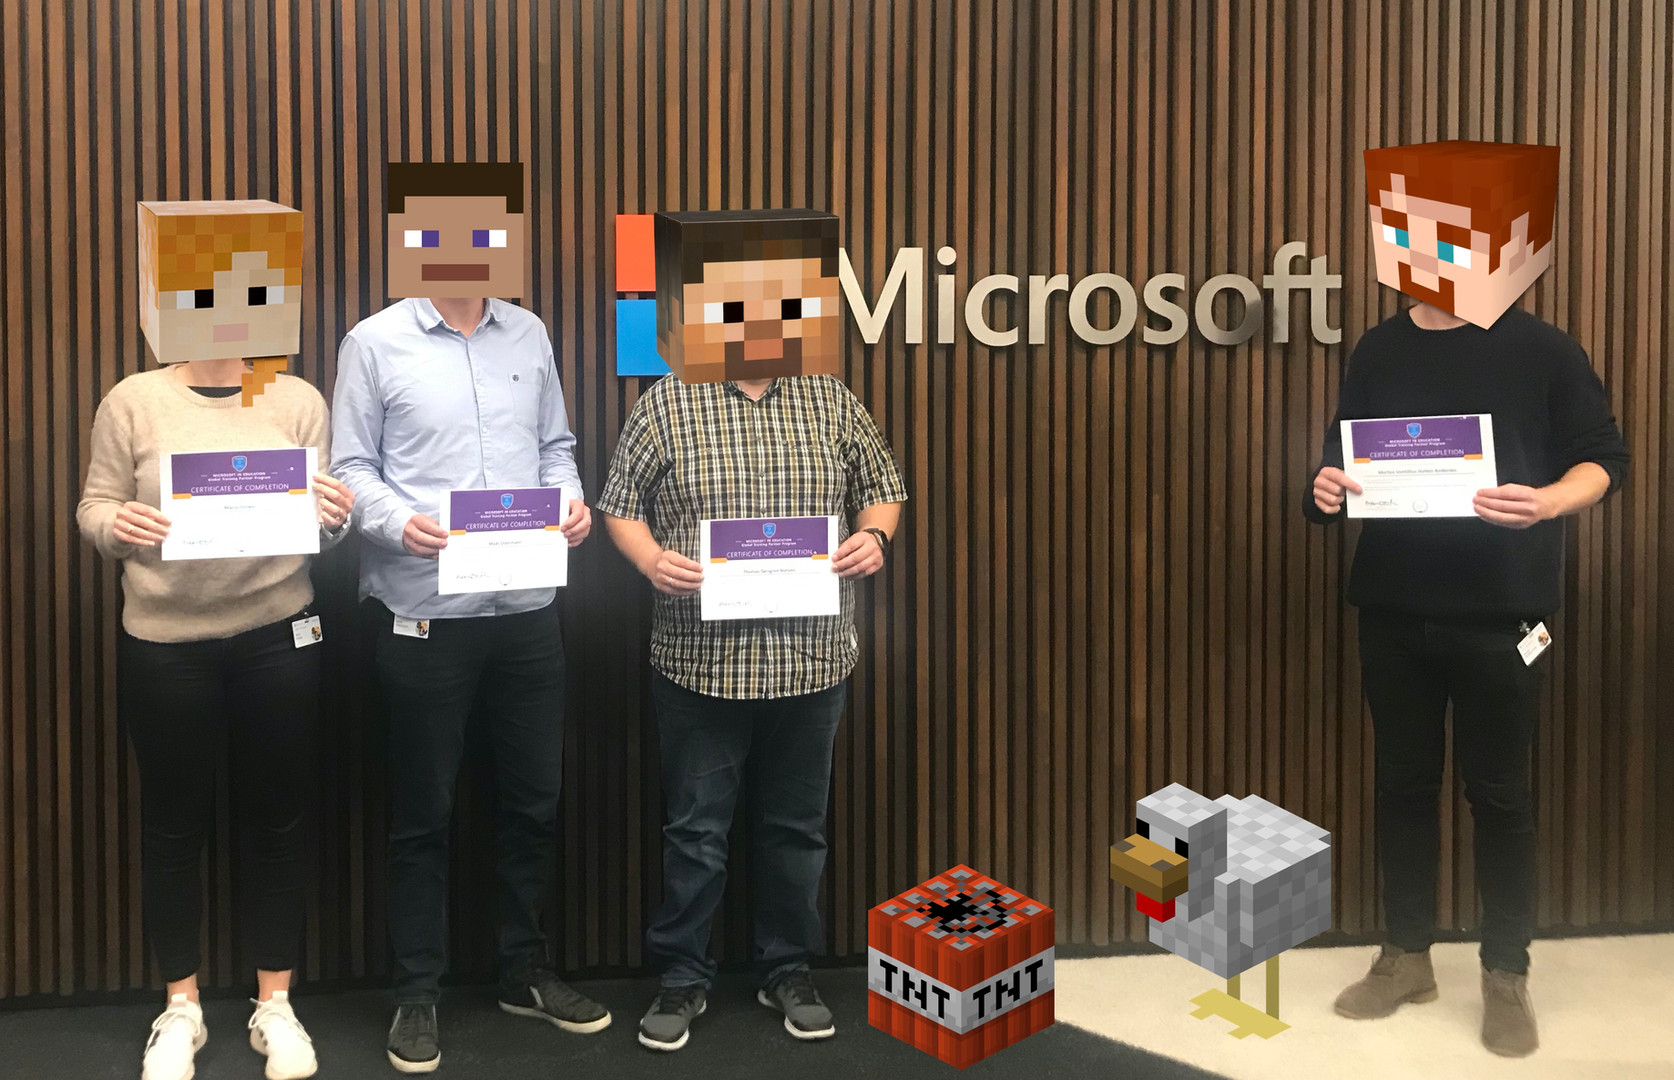 Microsoft event i Bruxelles